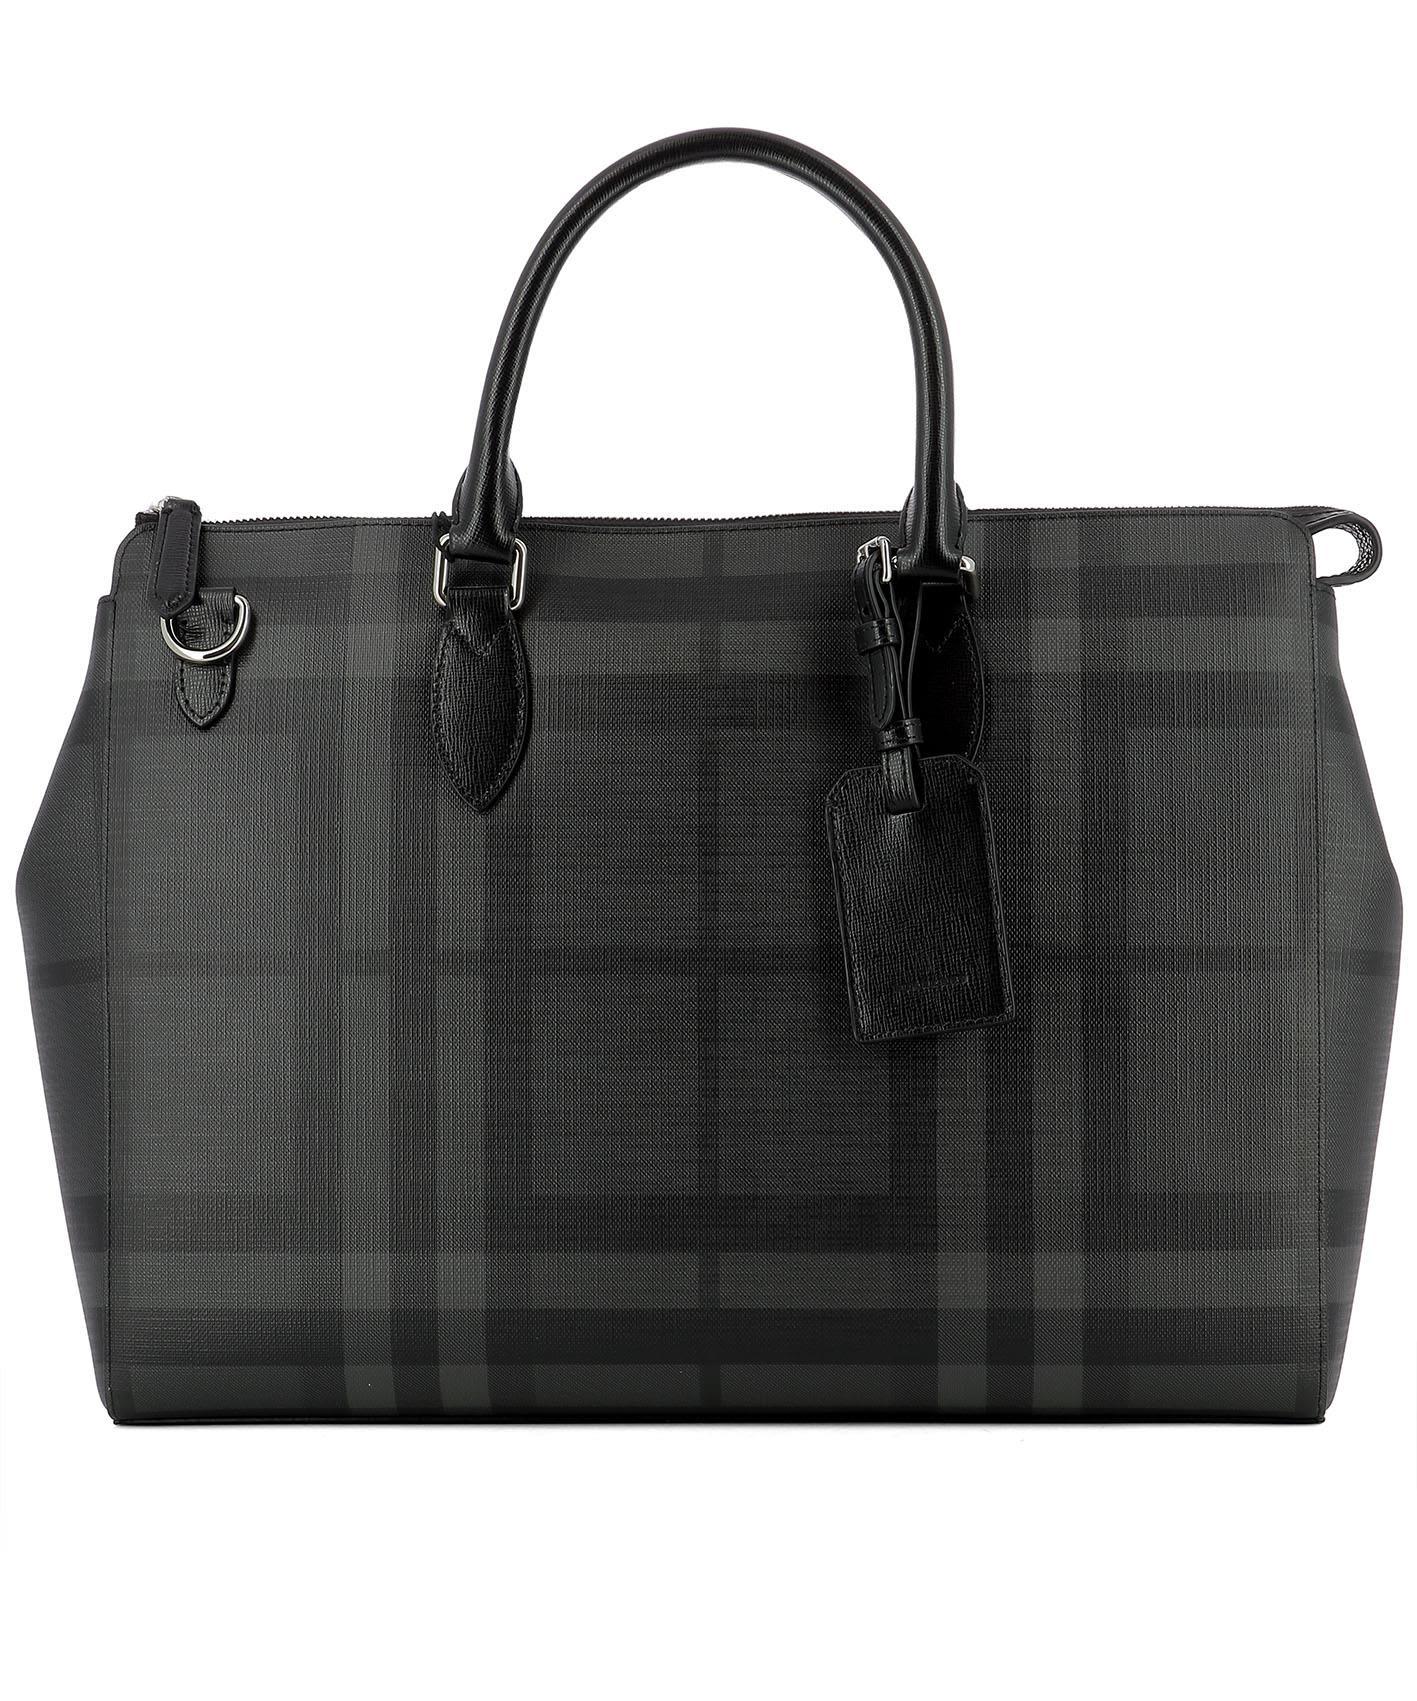 Burberry Pvcs BLACK PVC HANDLE BAG